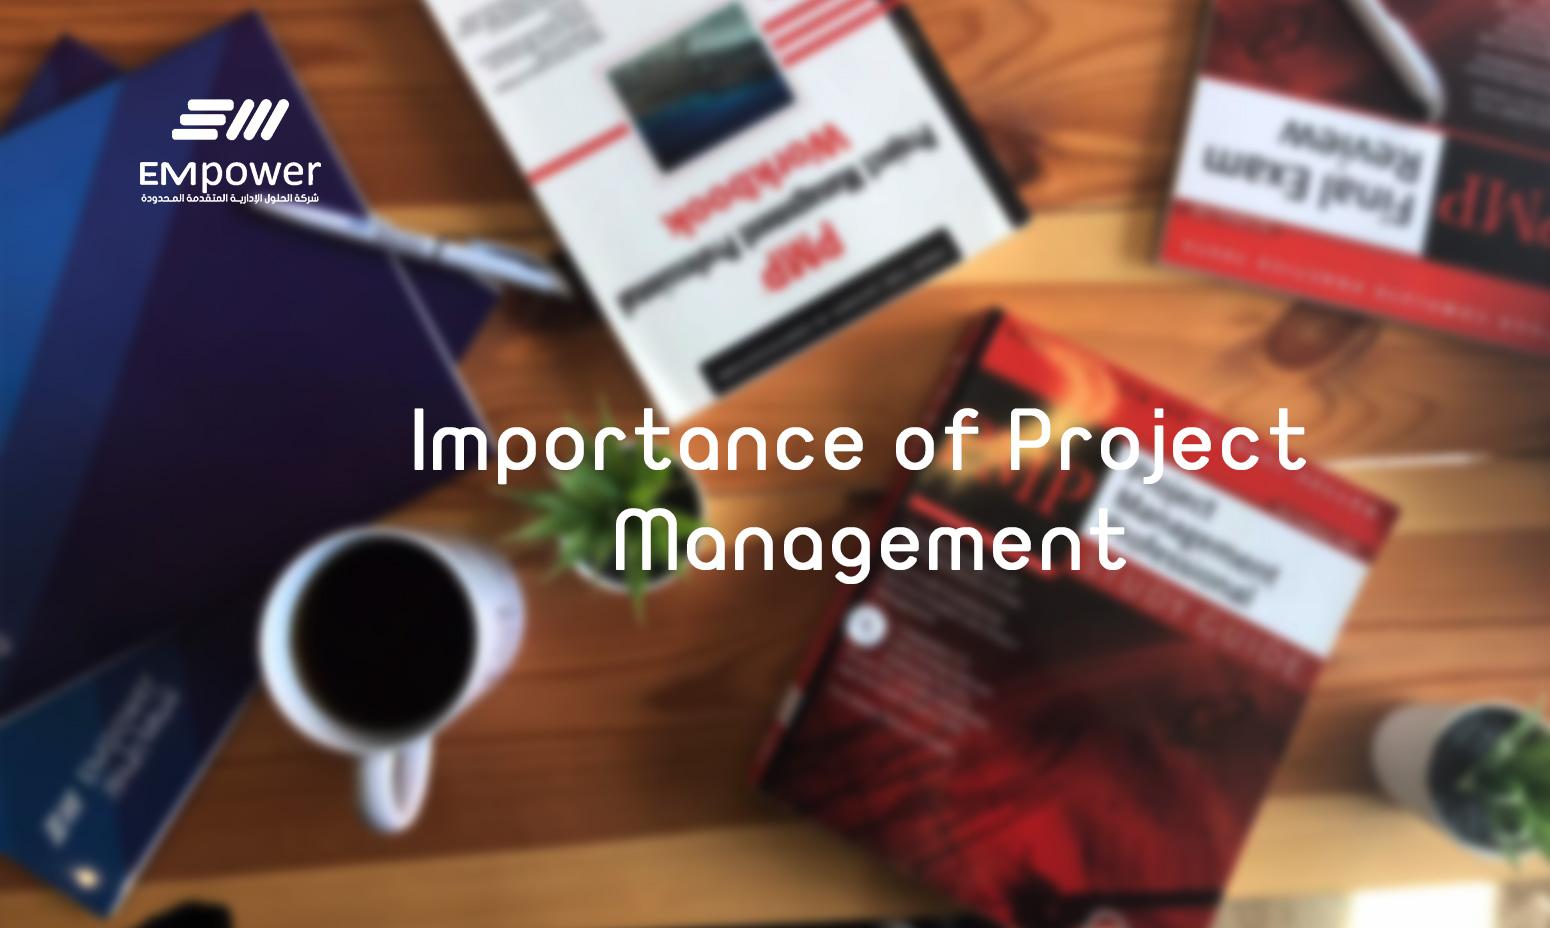 Importance of Project Management 1 - تأسيس مكاتب إدارة المشاريع PMO